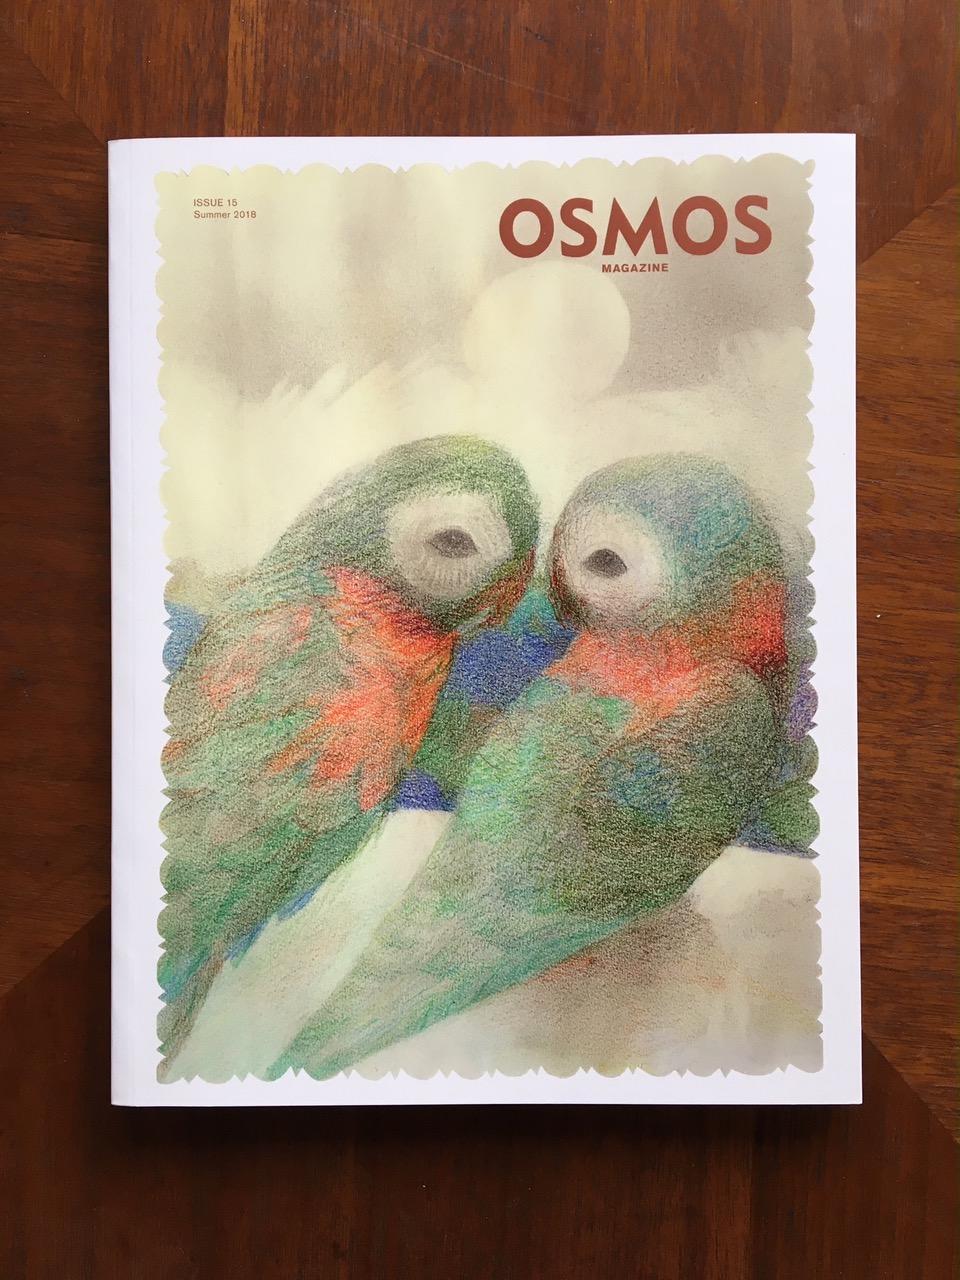 OSMOS 15 cover.jpeg